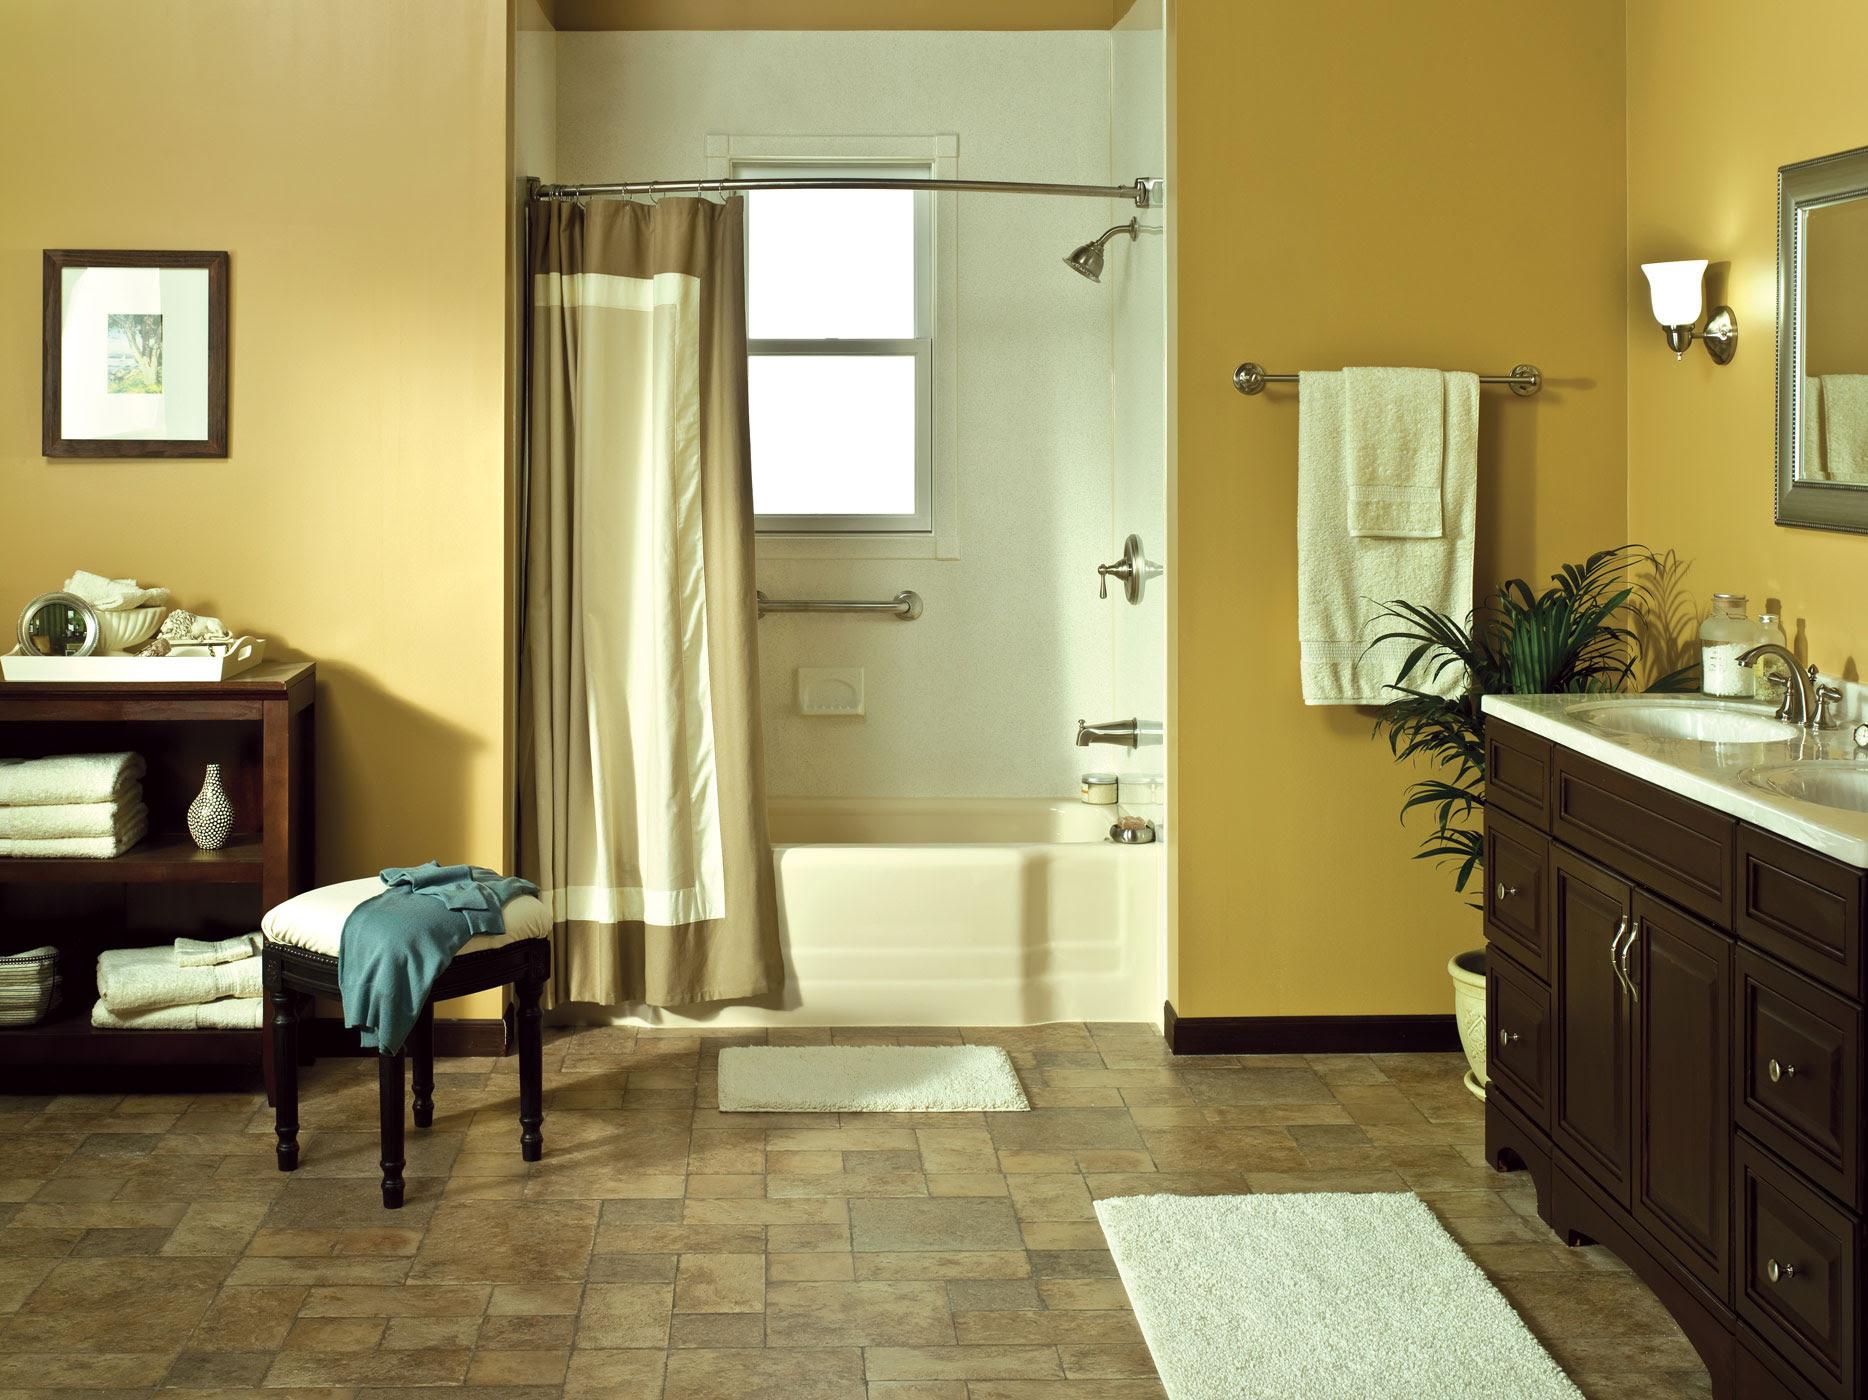 Bathroom Remodeling in St Charles MO